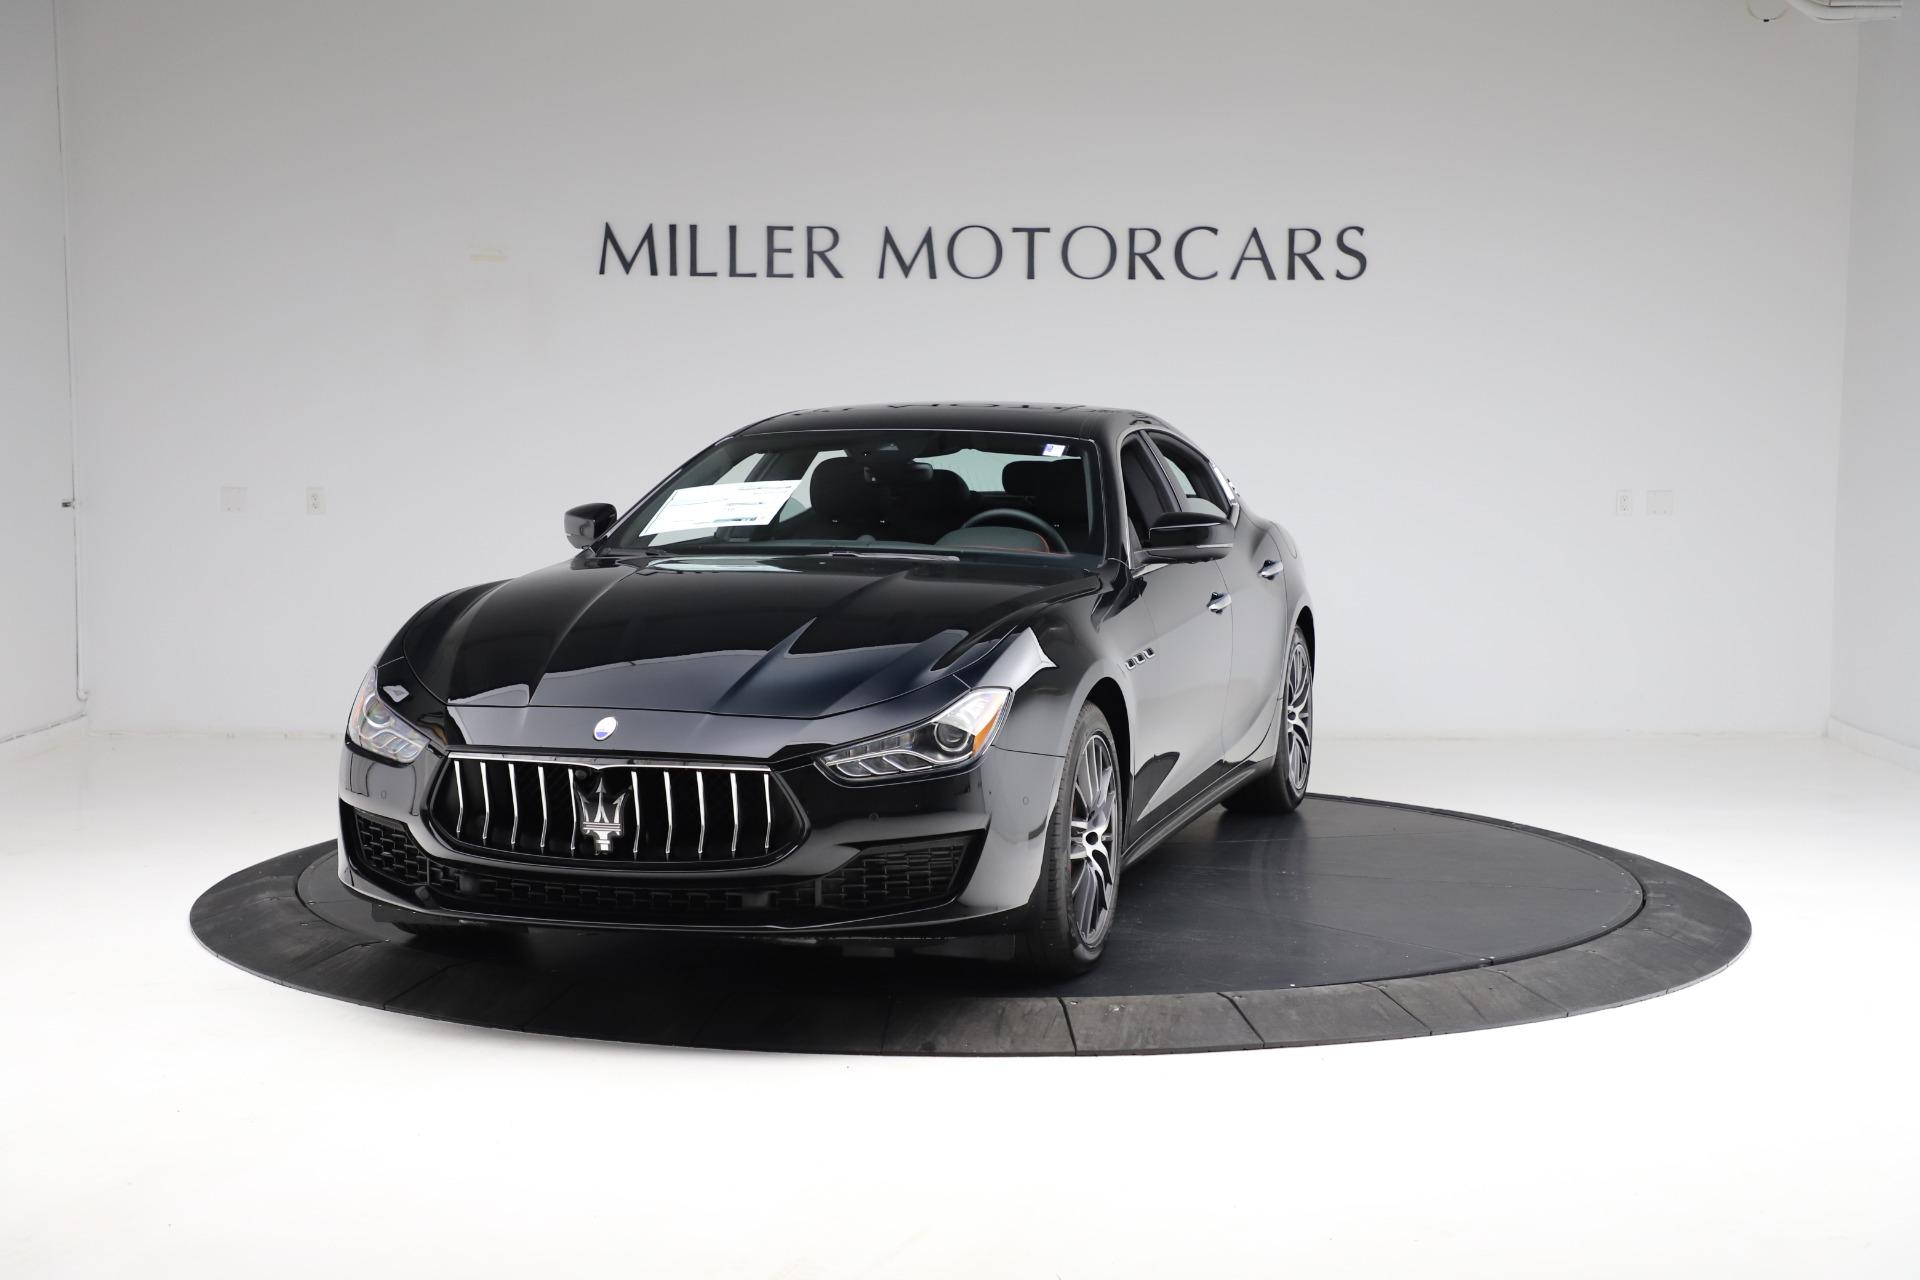 New 2021 Maserati Ghibli S Q4 for sale $86,654 at Pagani of Greenwich in Greenwich CT 06830 1